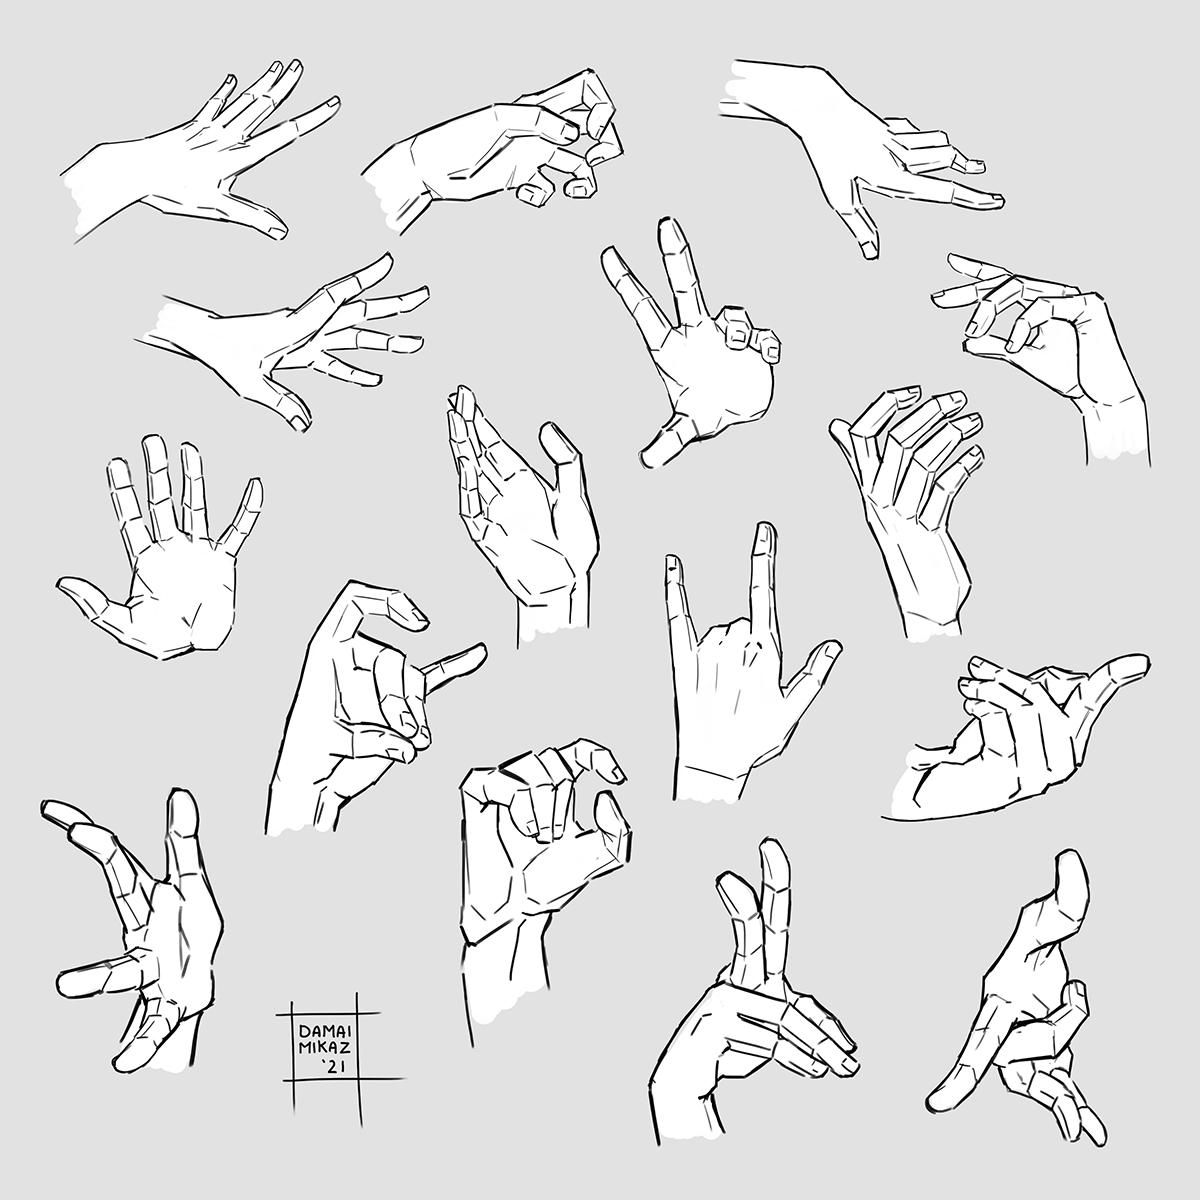 Sketchdump July 2021 [Hands]